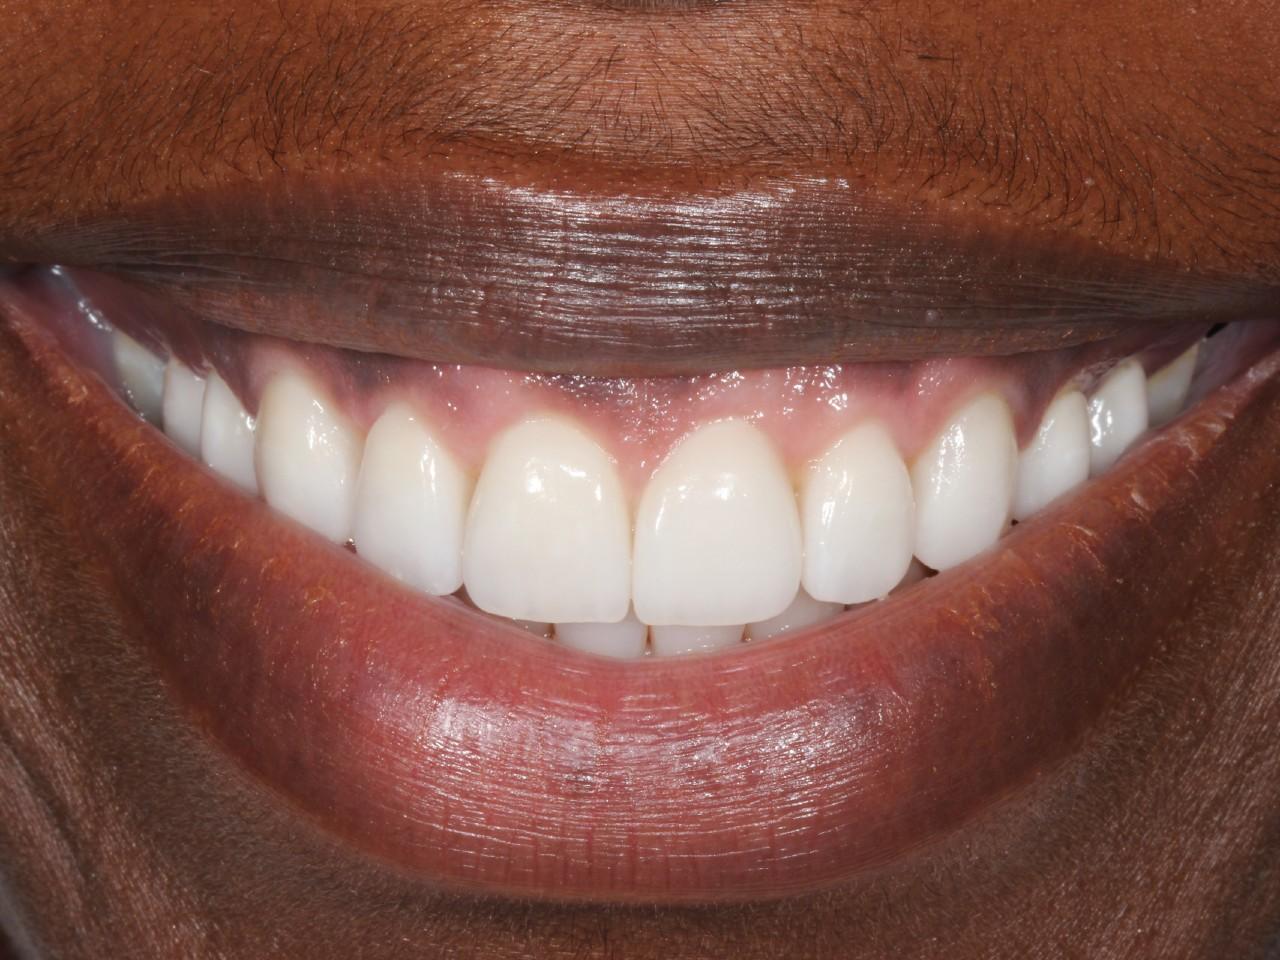 Periodontics, Gummy Smile, after